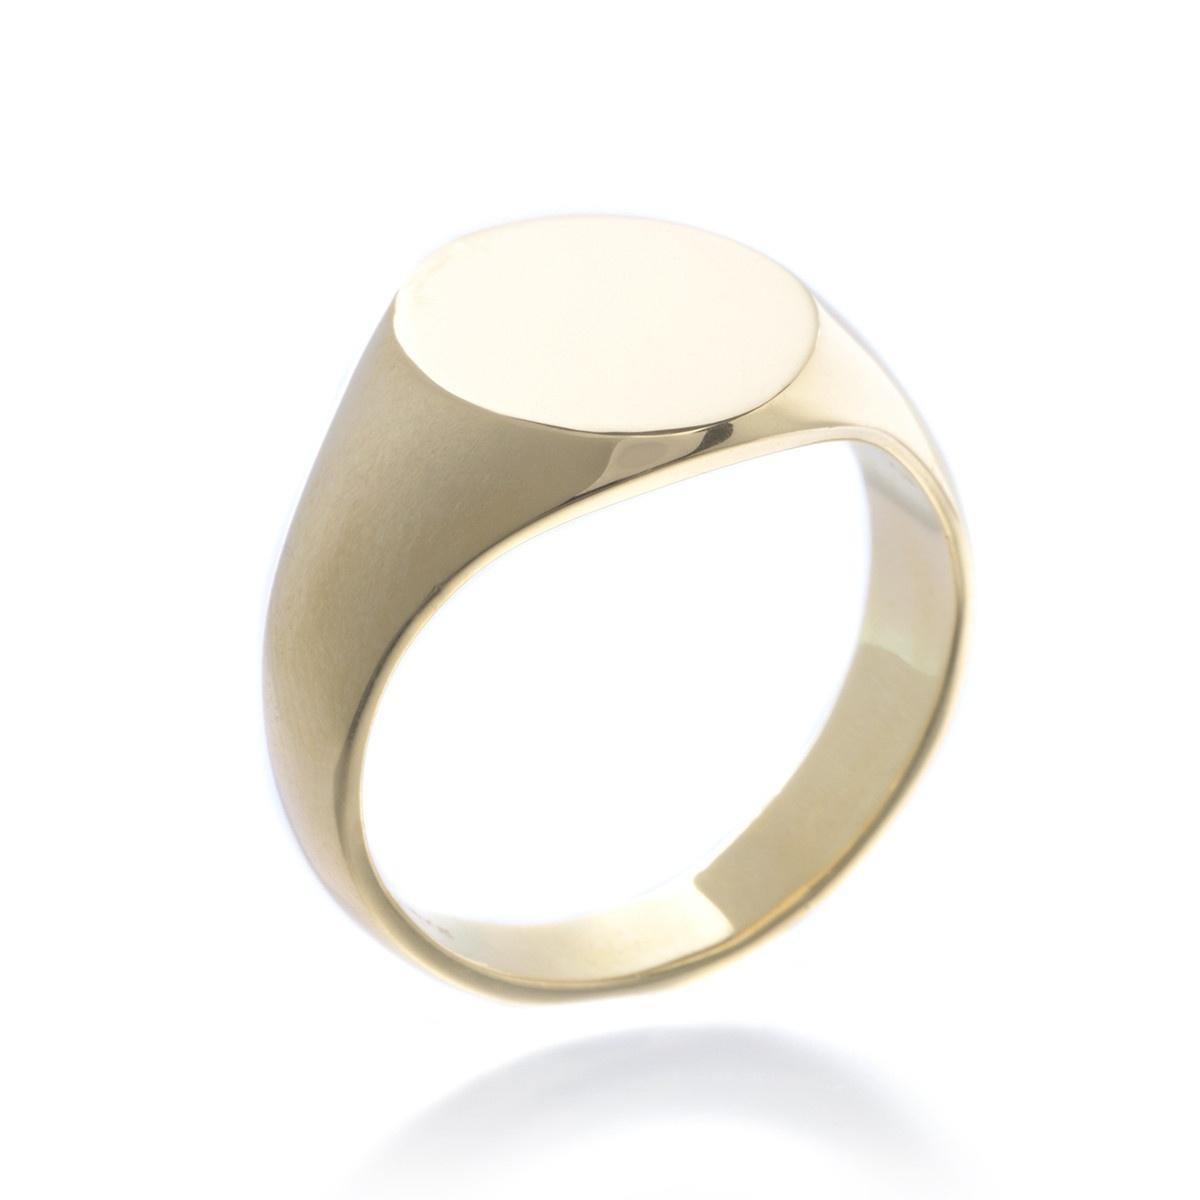 18K Yellow Gold Signant Ring